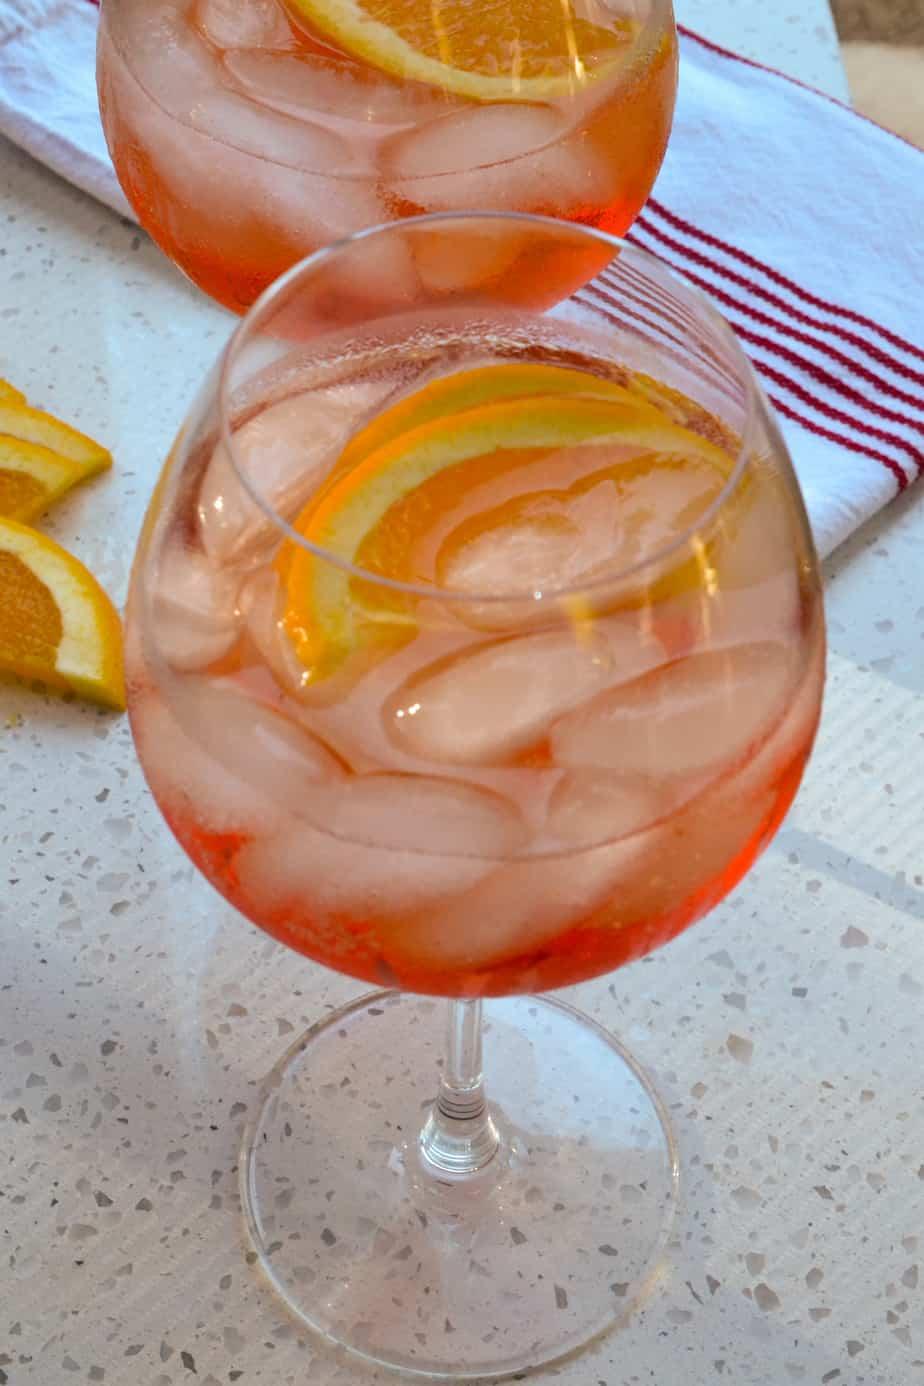 Aperol spritz cocktail over ice with orange slices.